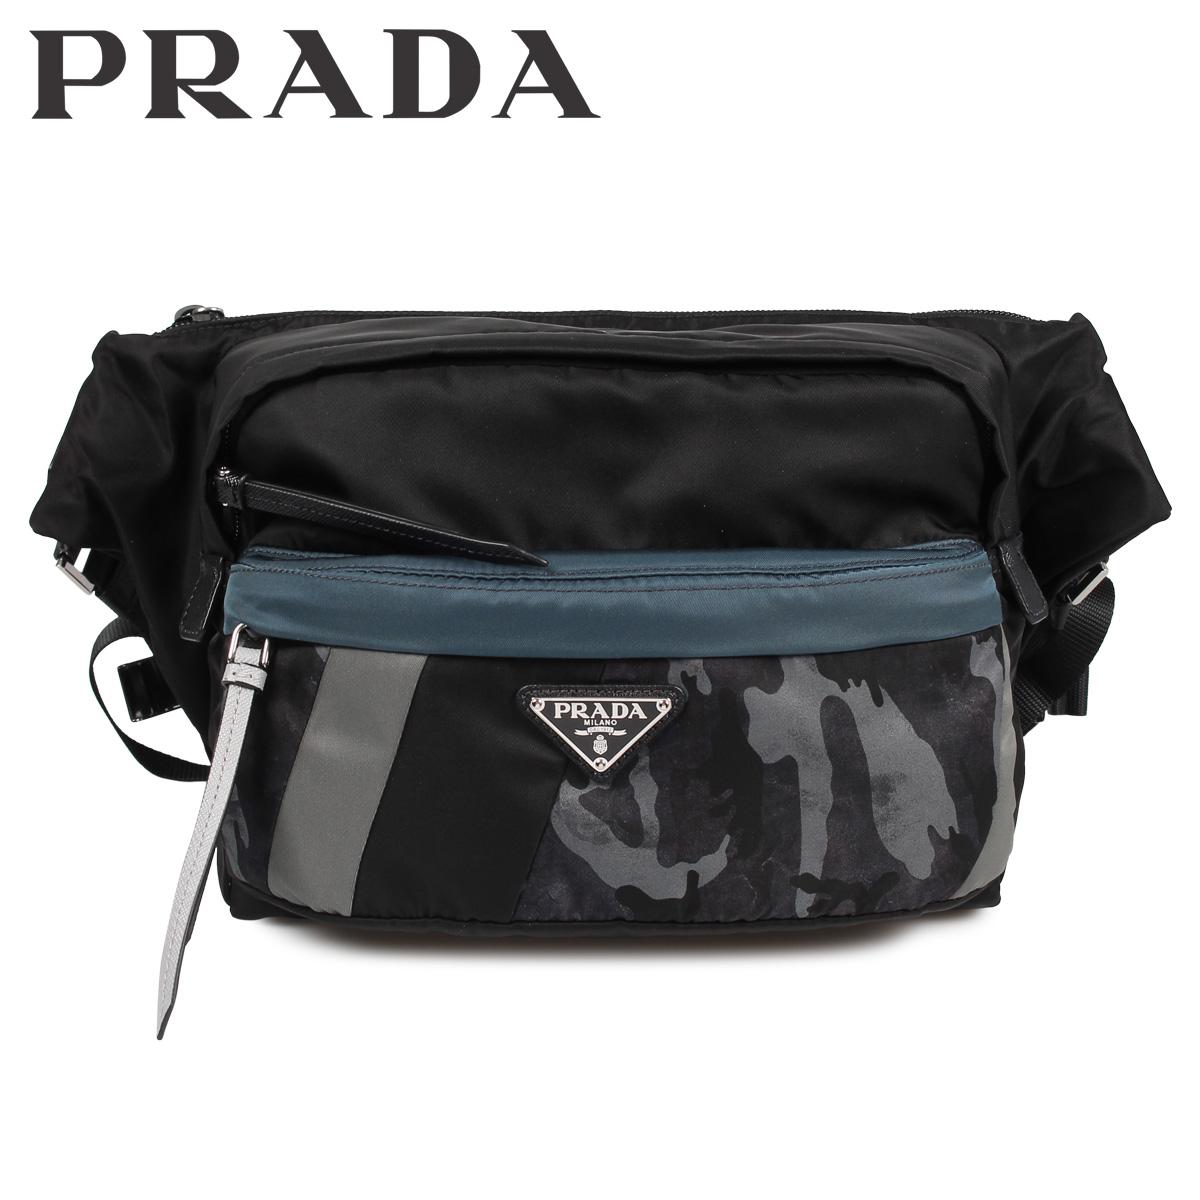 PRADA NYLON TECHNICALFABRIC CROSSBODY BAG プラダ バッグ ボディバッグ ショルダーバッグ メンズ レディース ブラック 黒 2VH038 [1910]